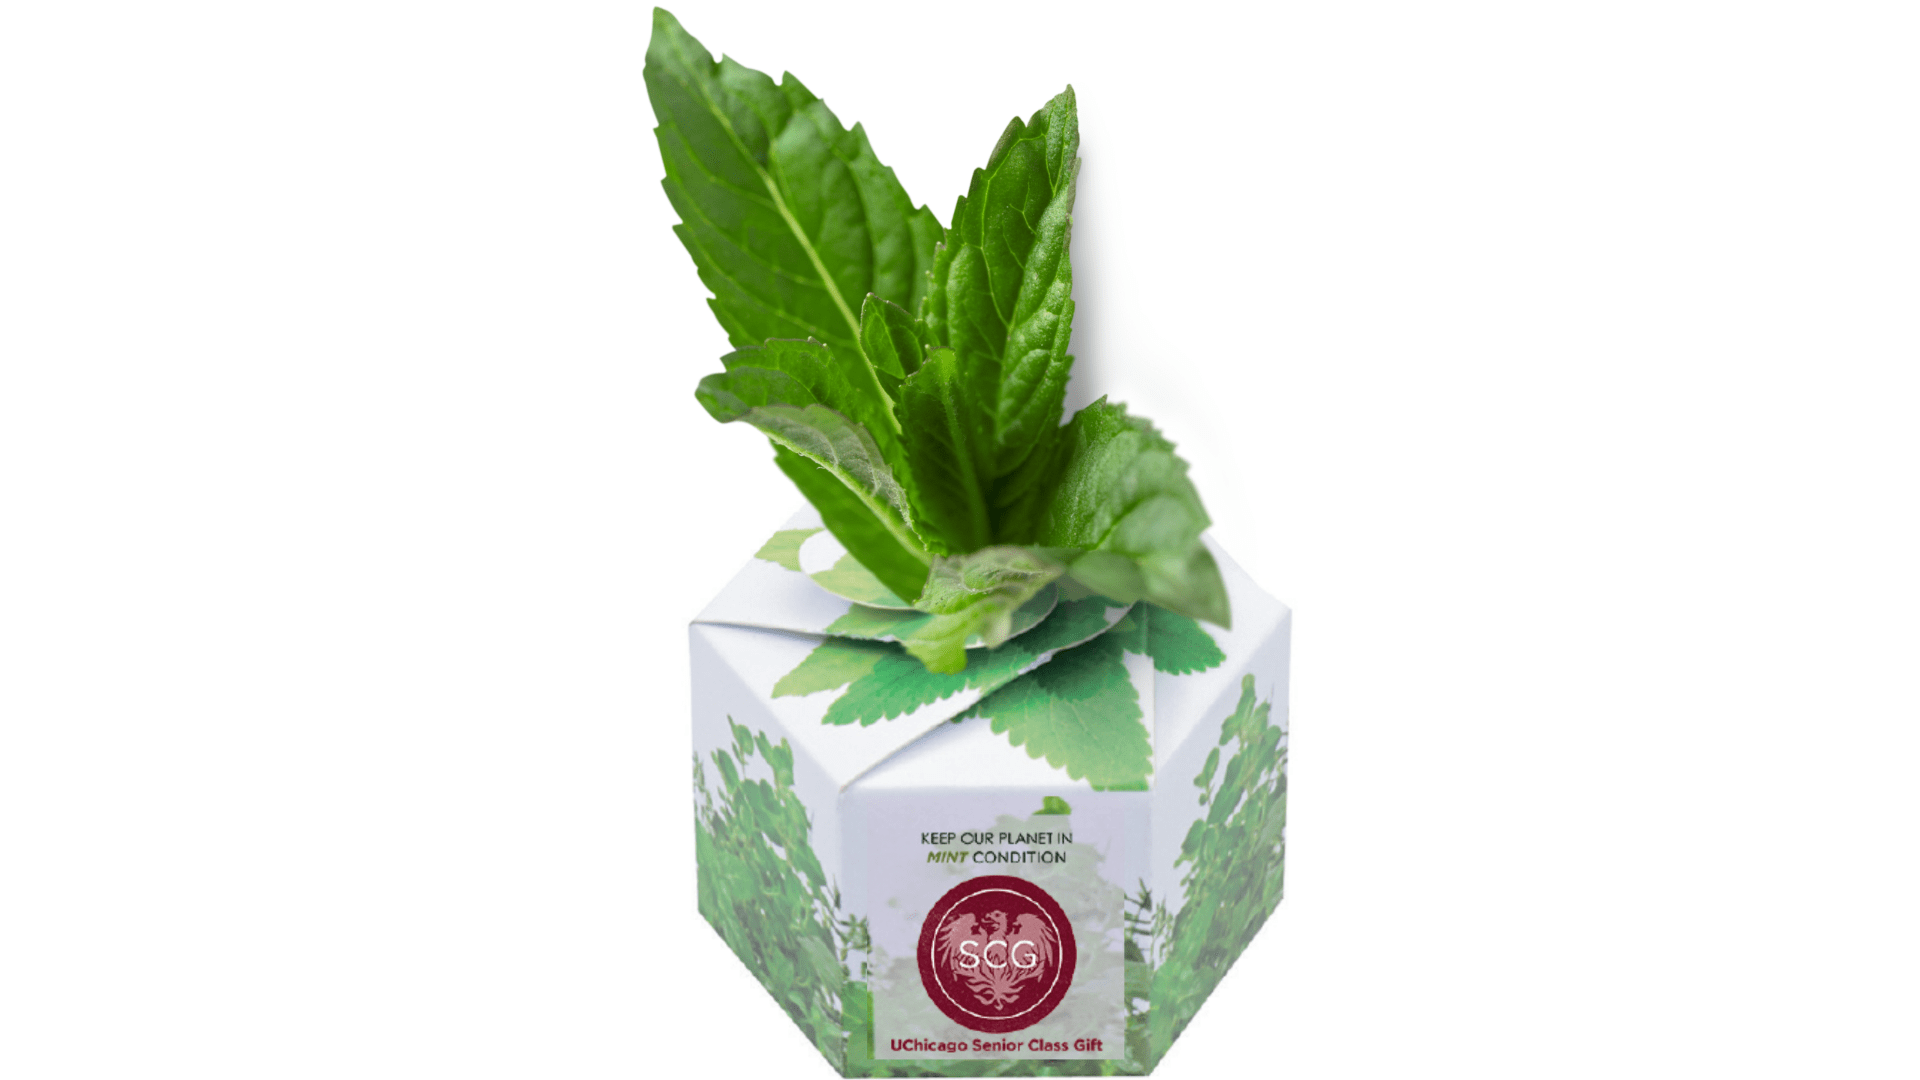 uchicago planter with mint